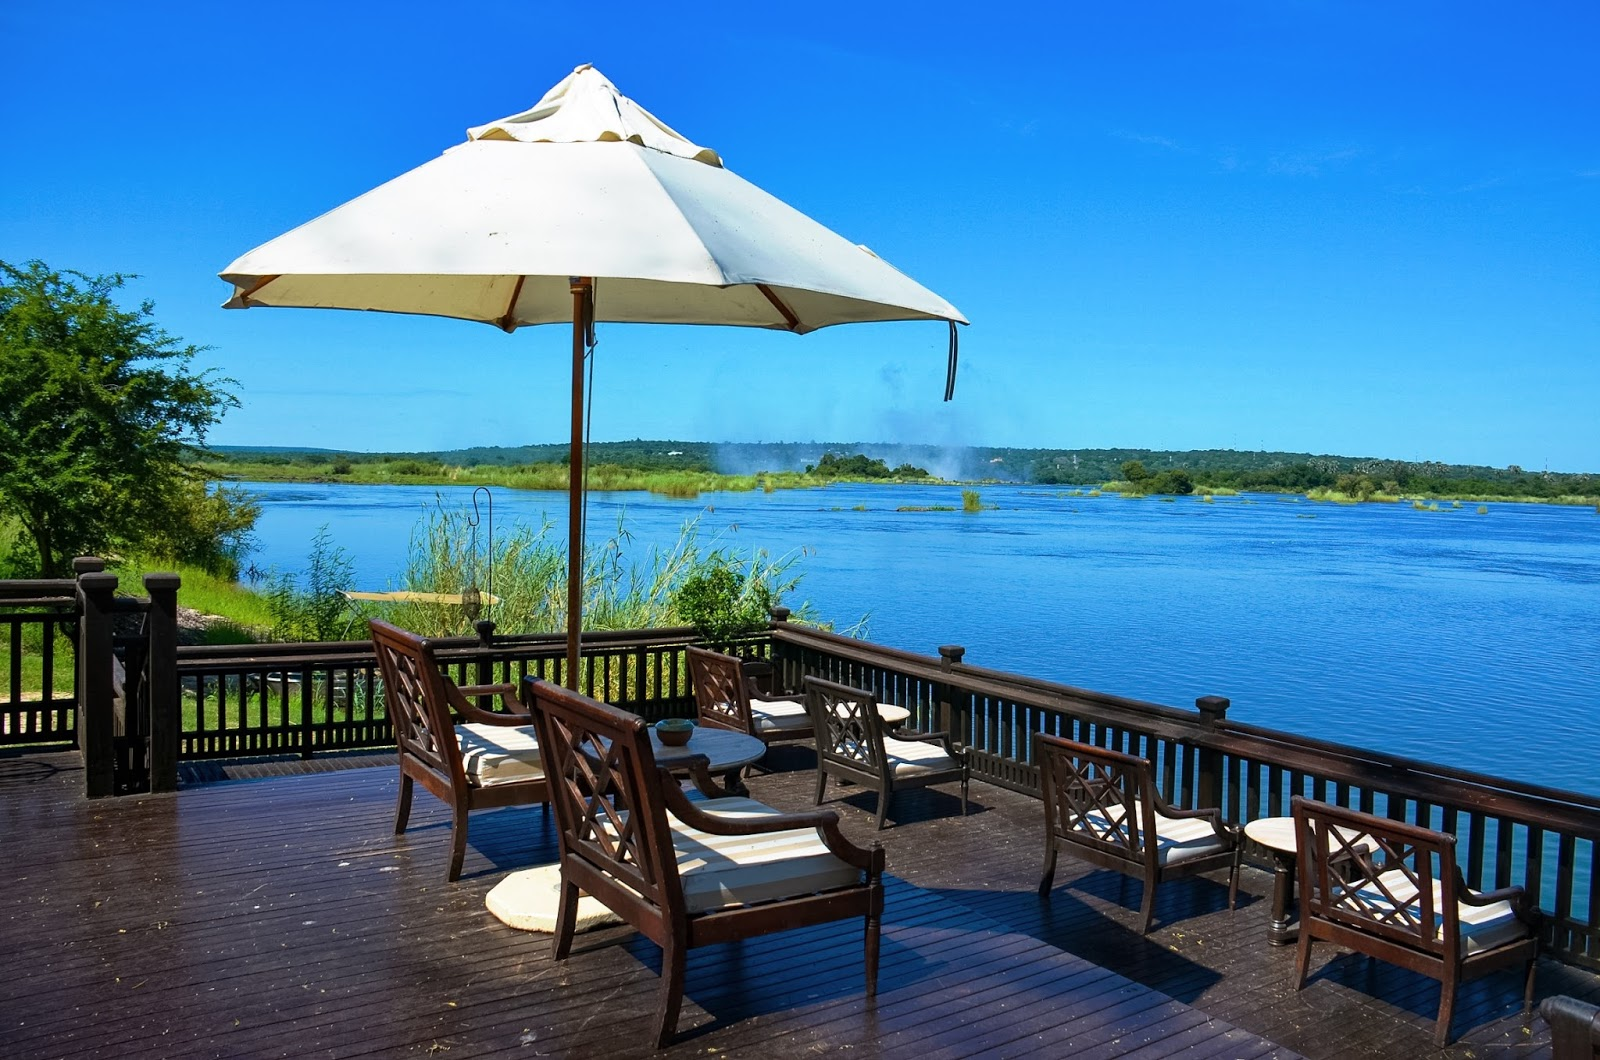 livingstone hotel zambia